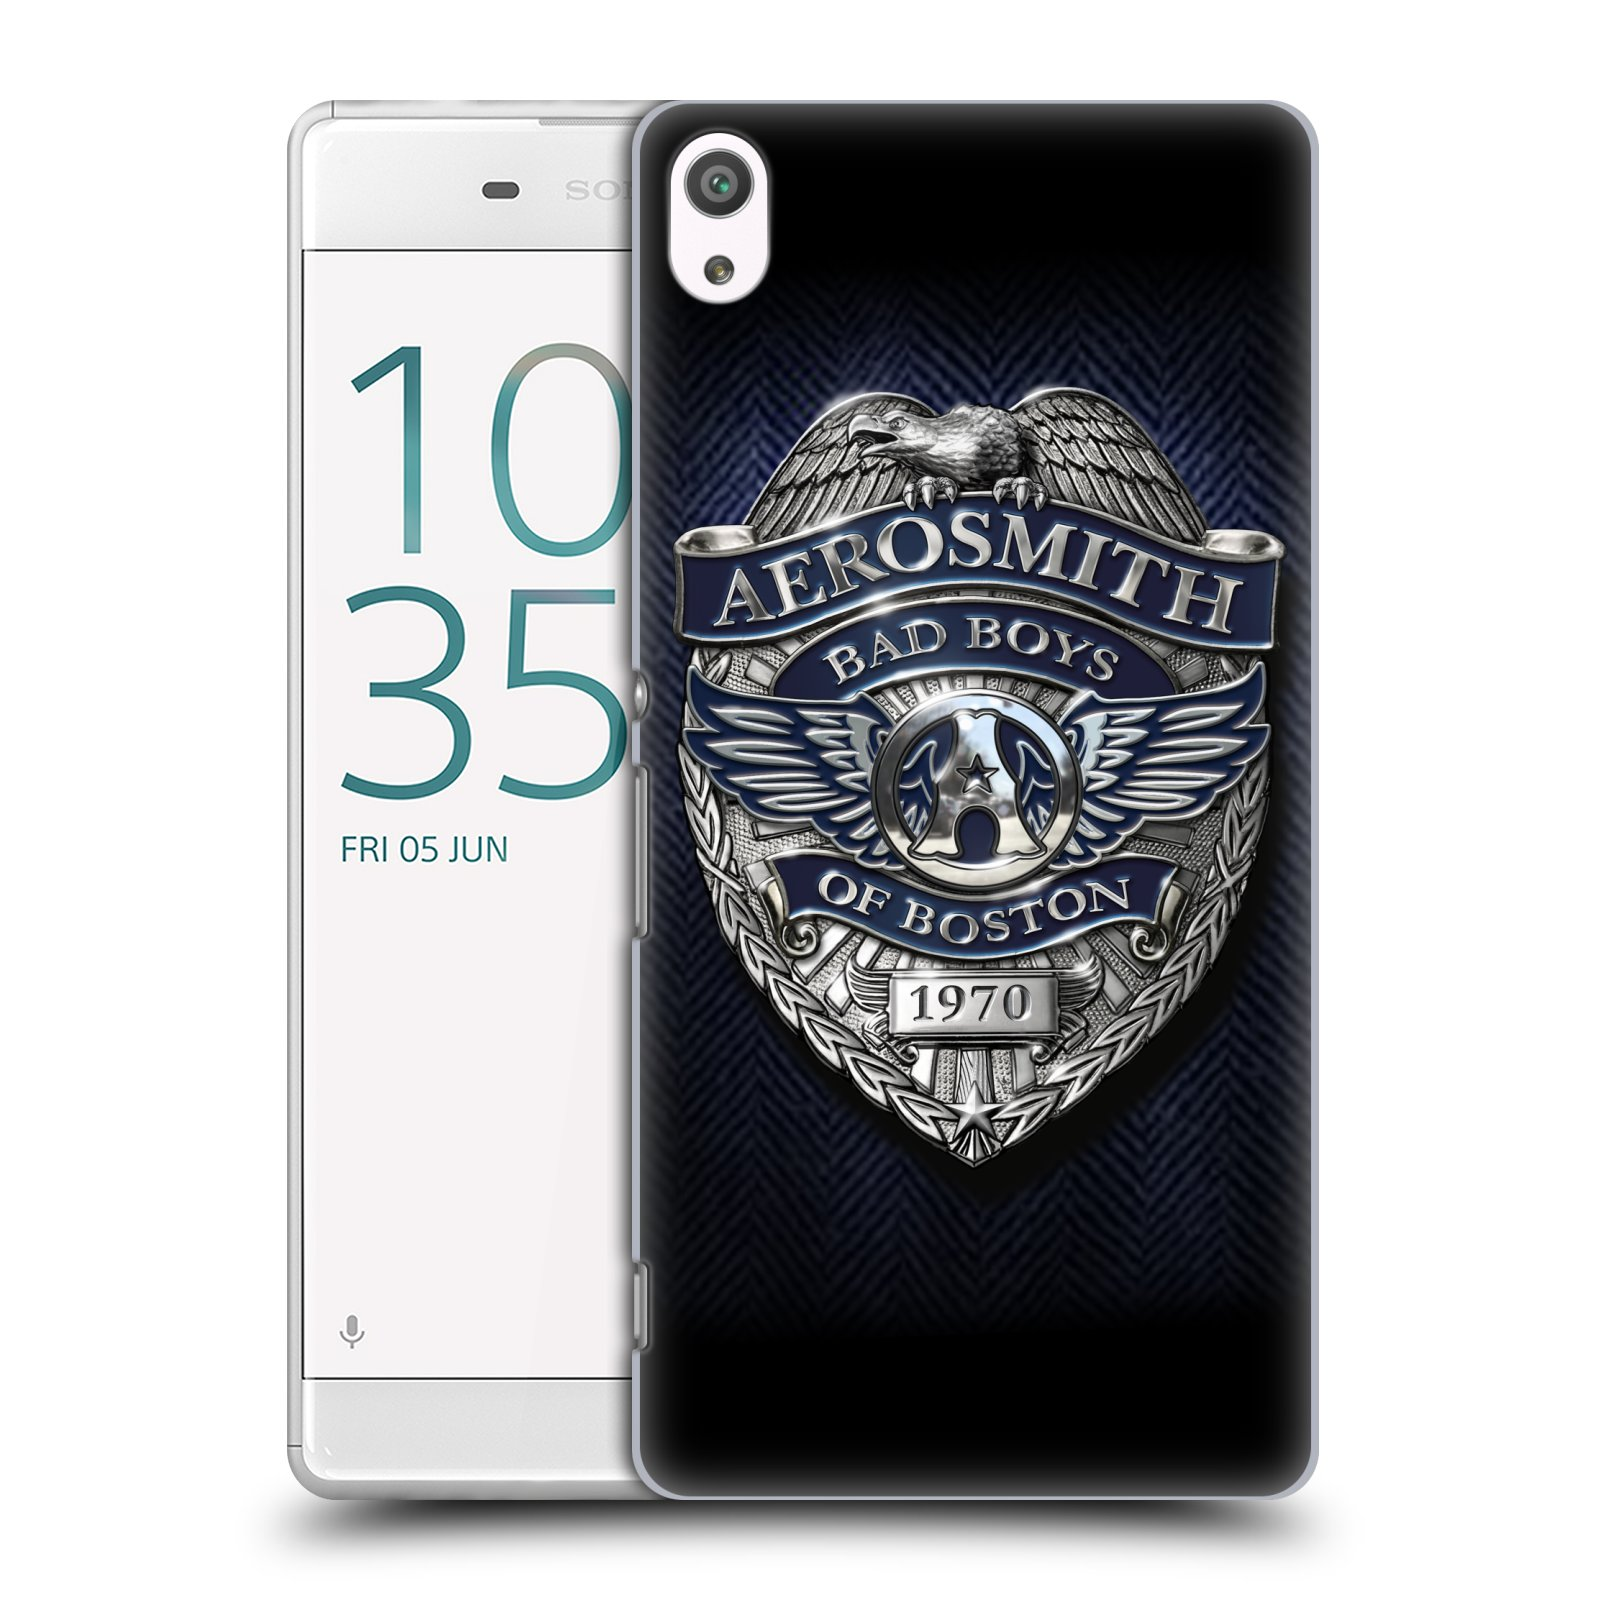 Plastové pouzdro na mobil Sony Xperia XA Ultra HEAD CASE - Aerosmith - Bad Boys of Boston